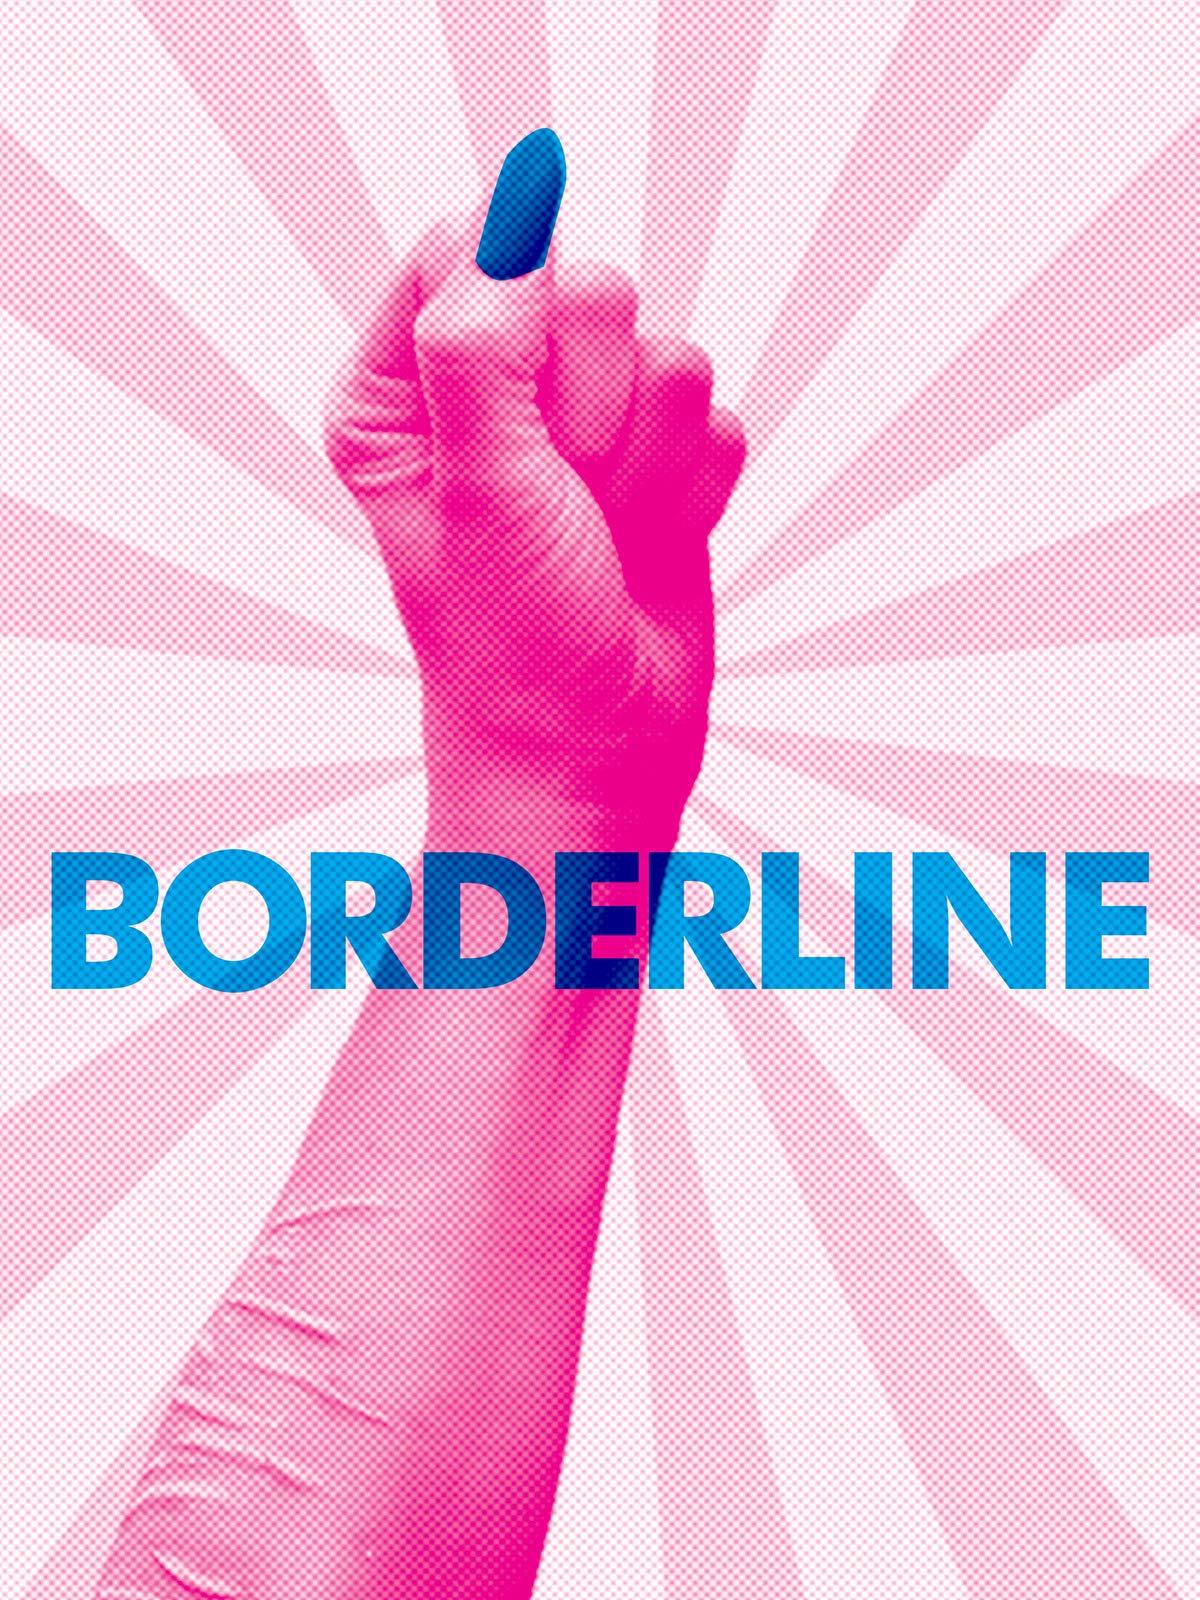 Borderline on Amazon Prime Video UK